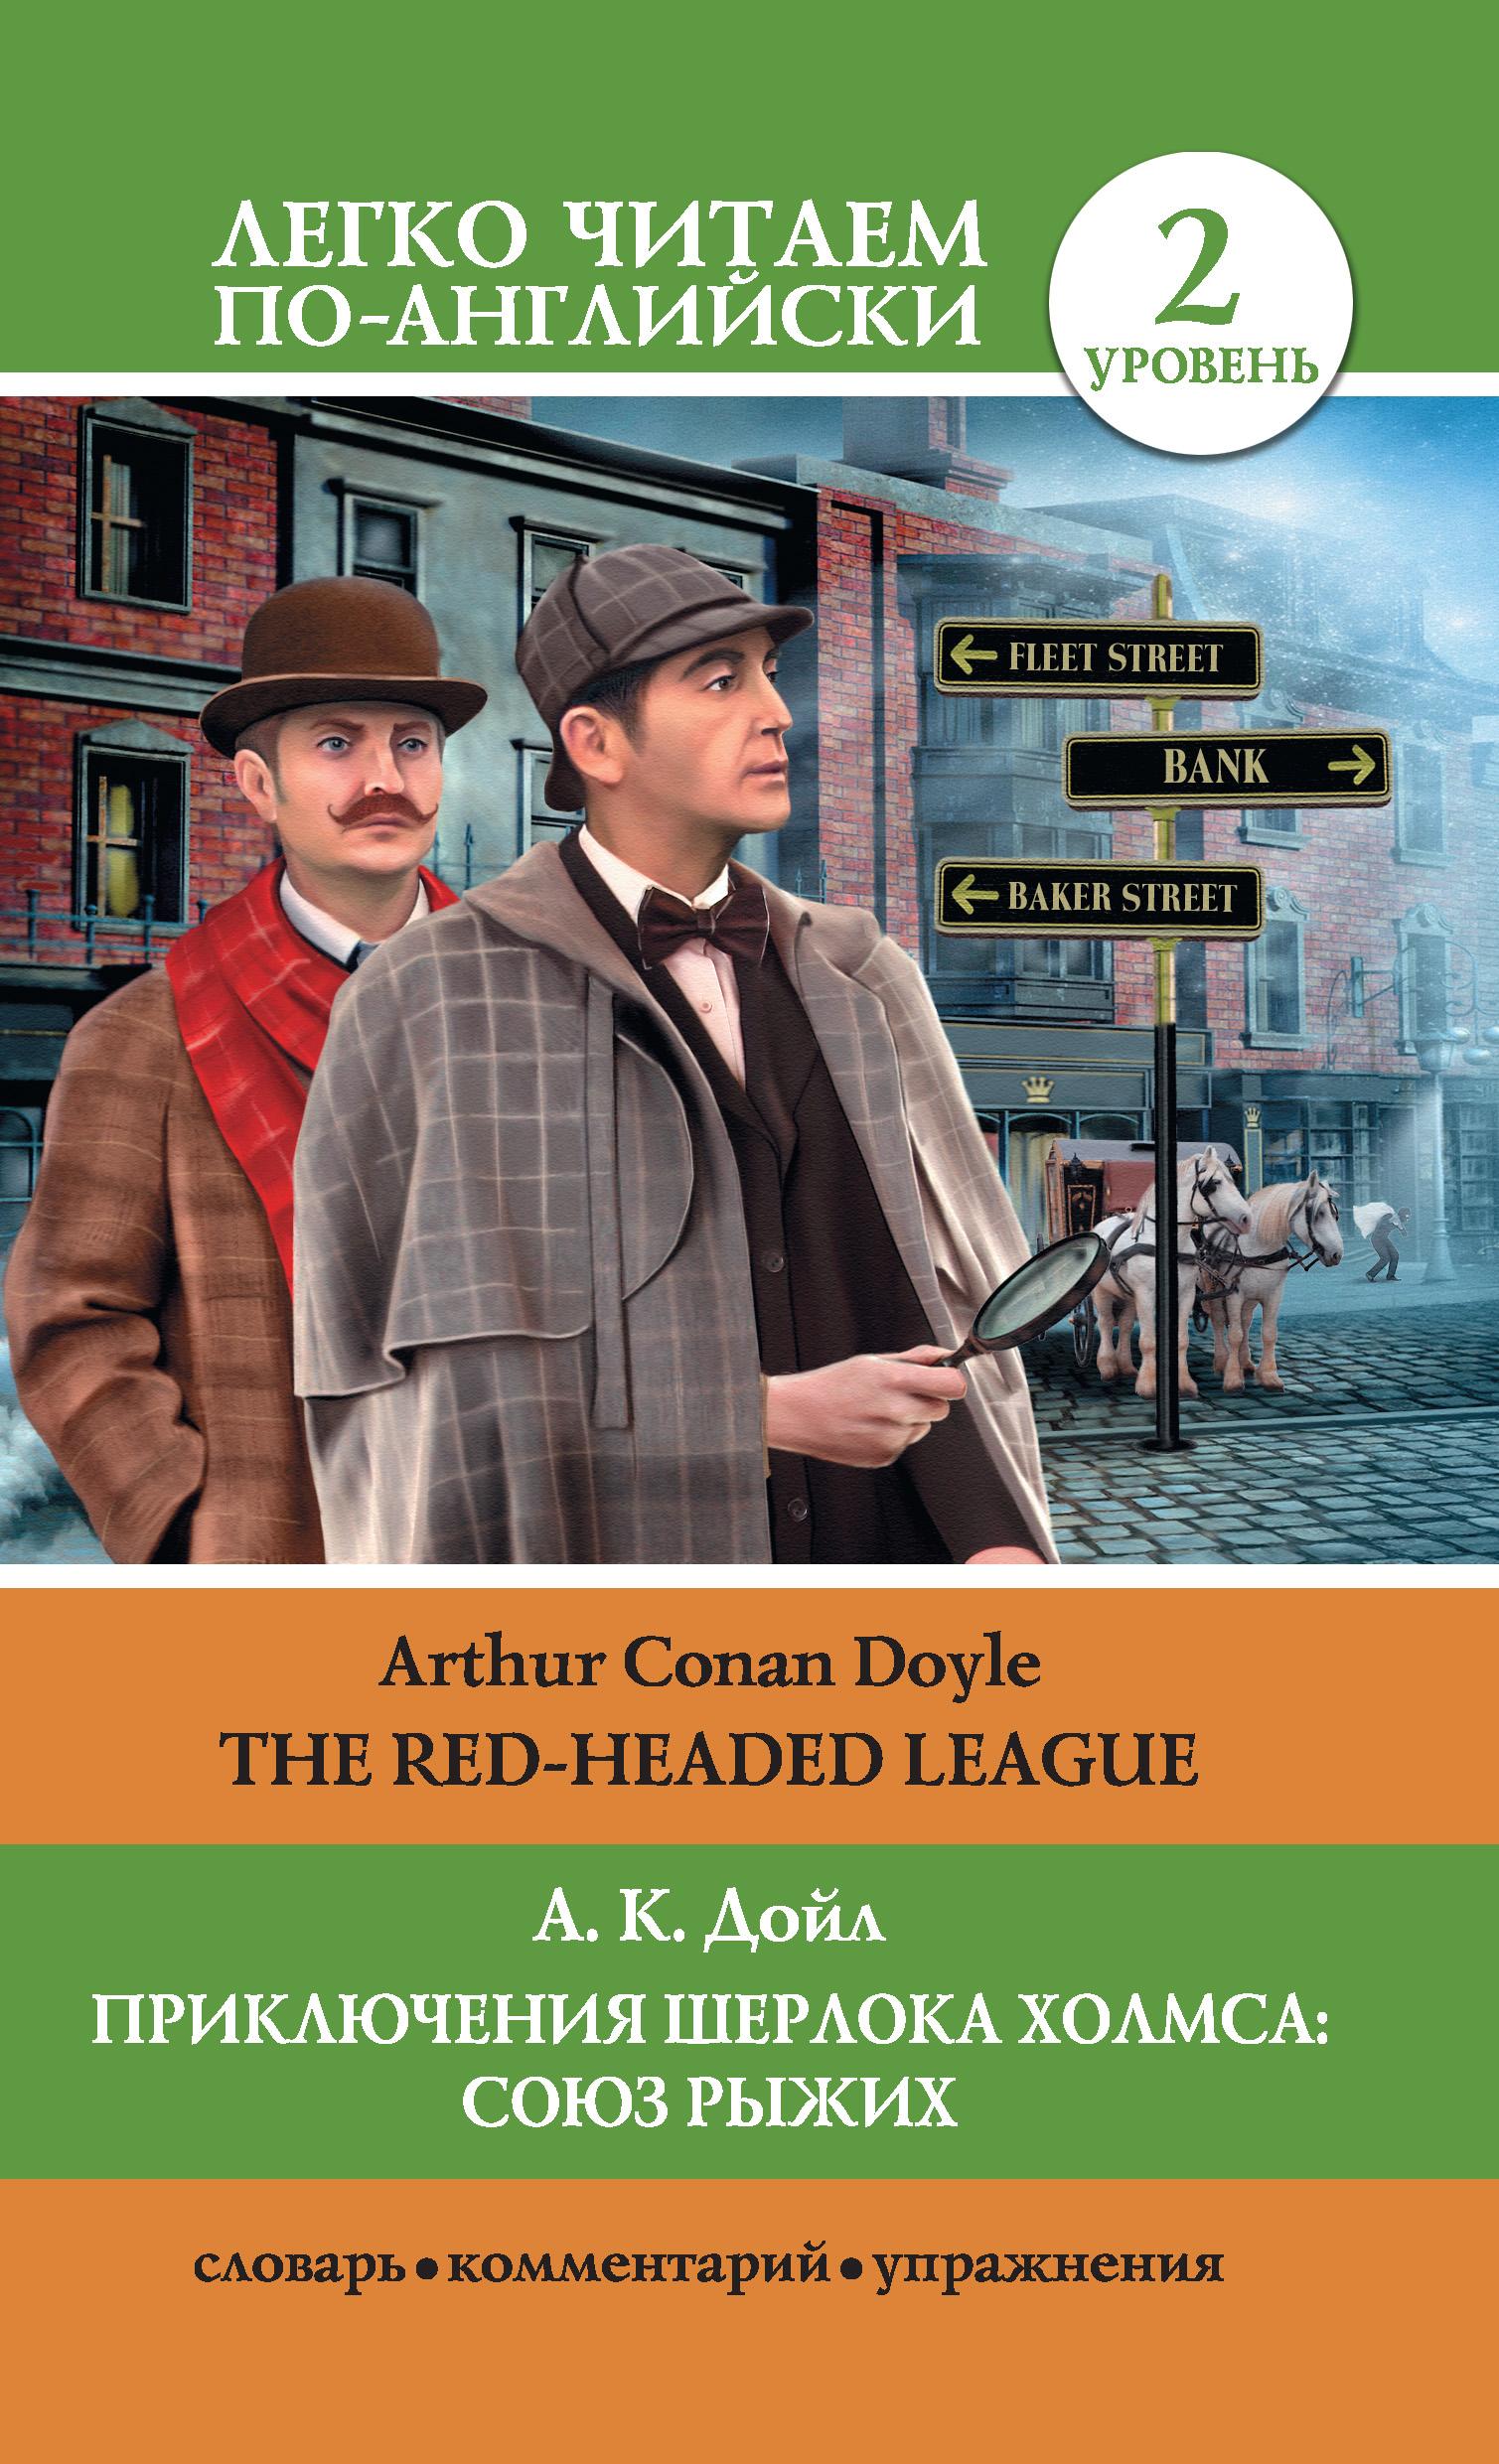 Артур Конан Дойл Приключения Шерлока Холмса: Союз Рыжих / The Red-Headed League